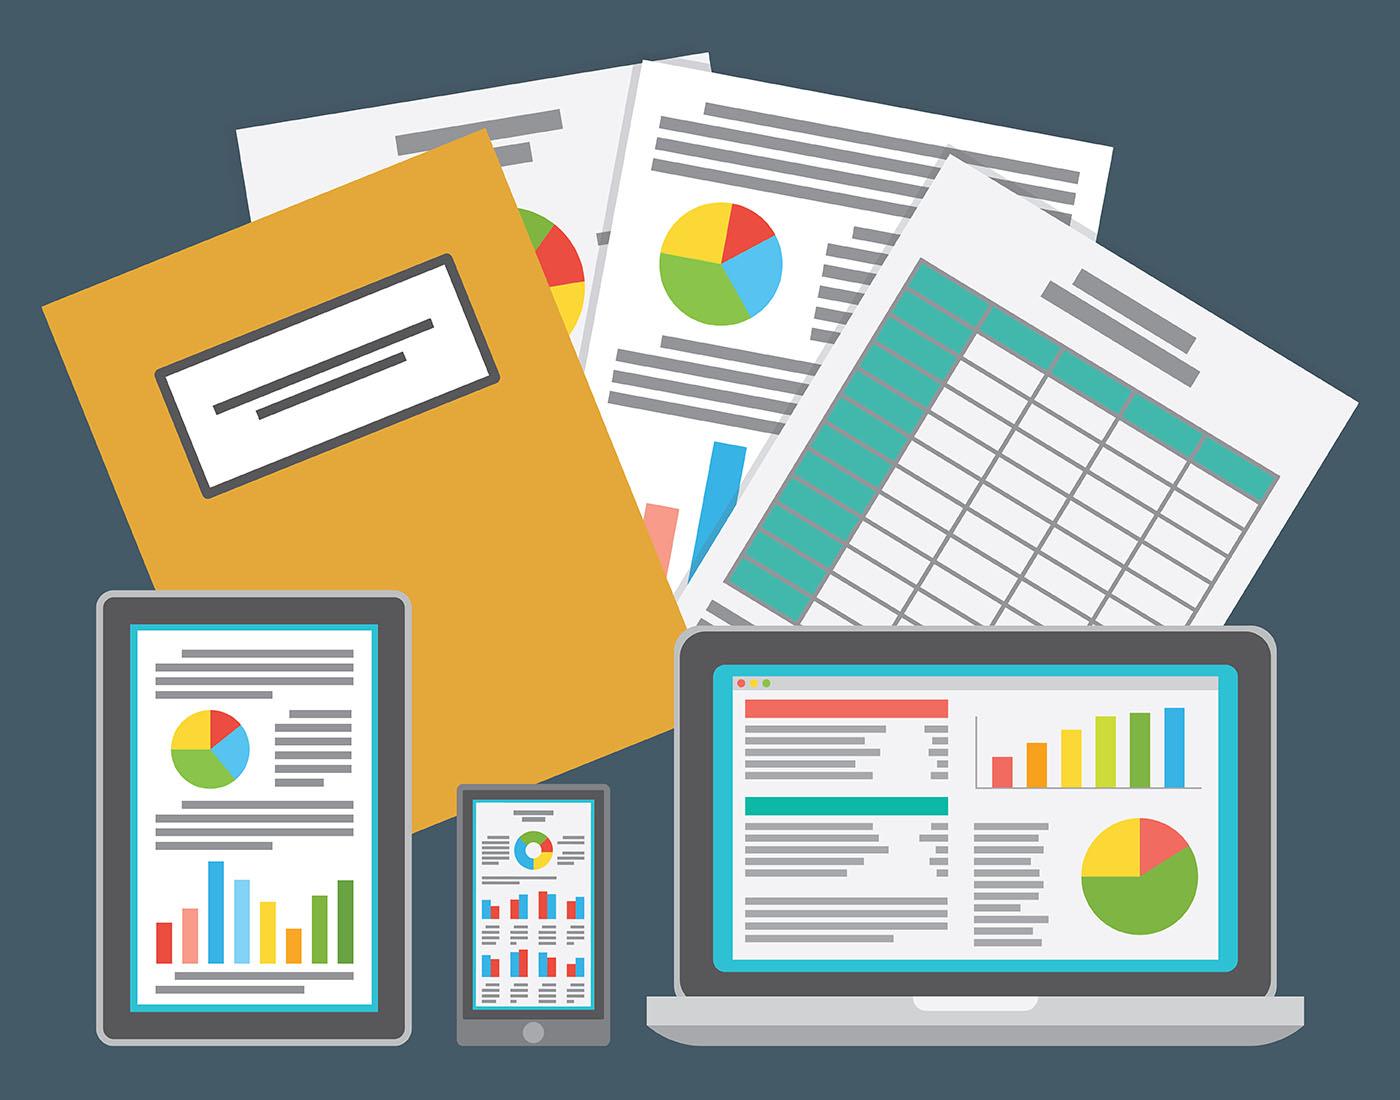 template for spreadsheet